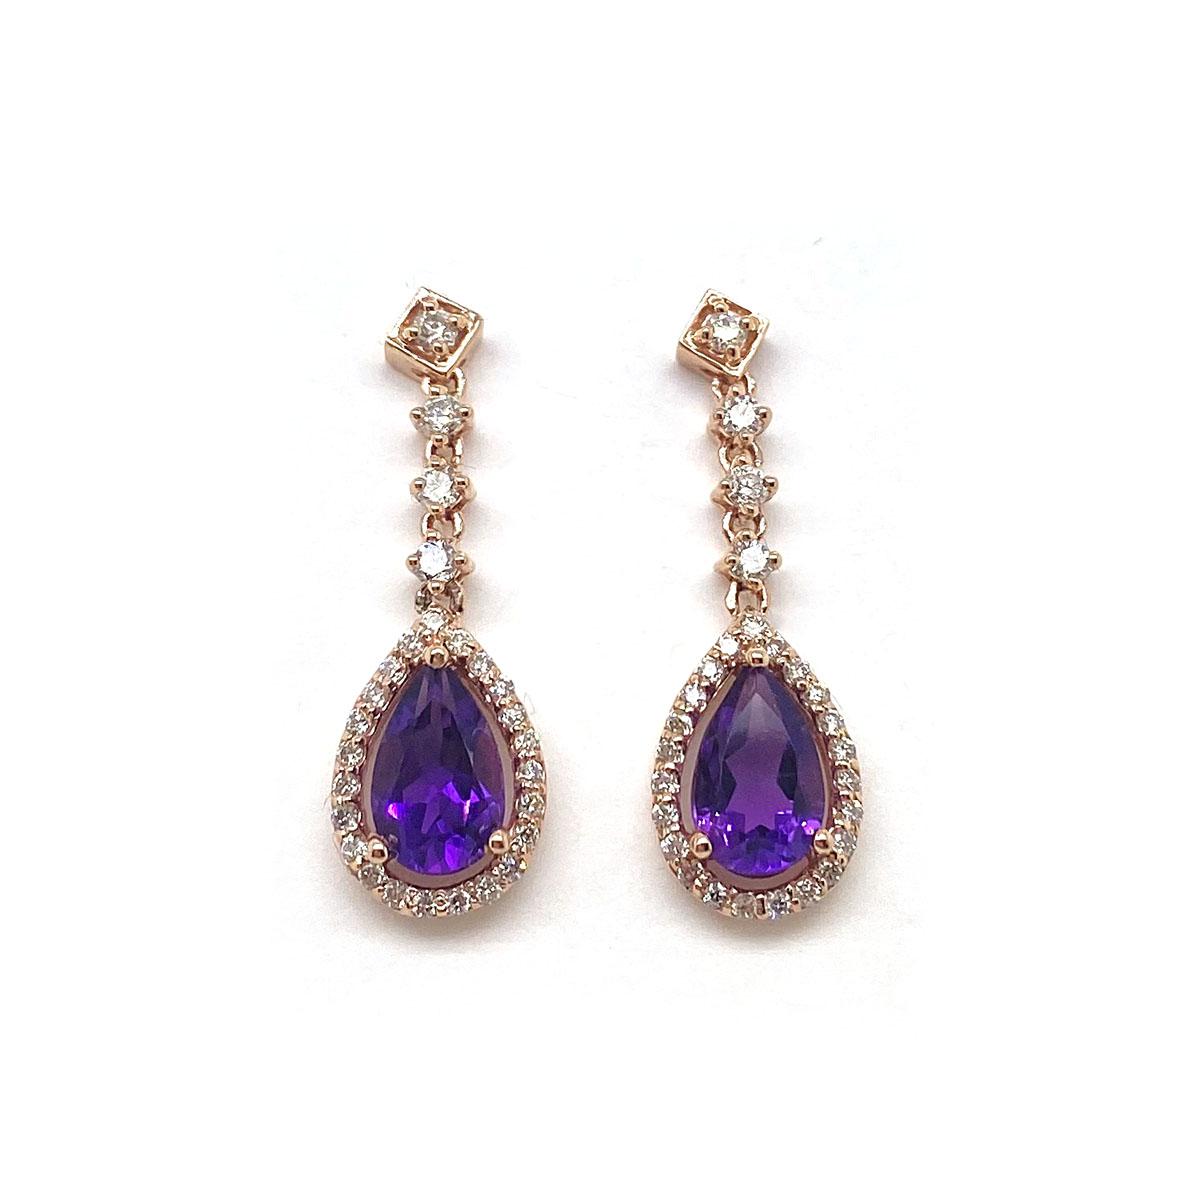 14 Karat Rose Gold Pear Shaped Amethyst and Diamond Dangle Earrings